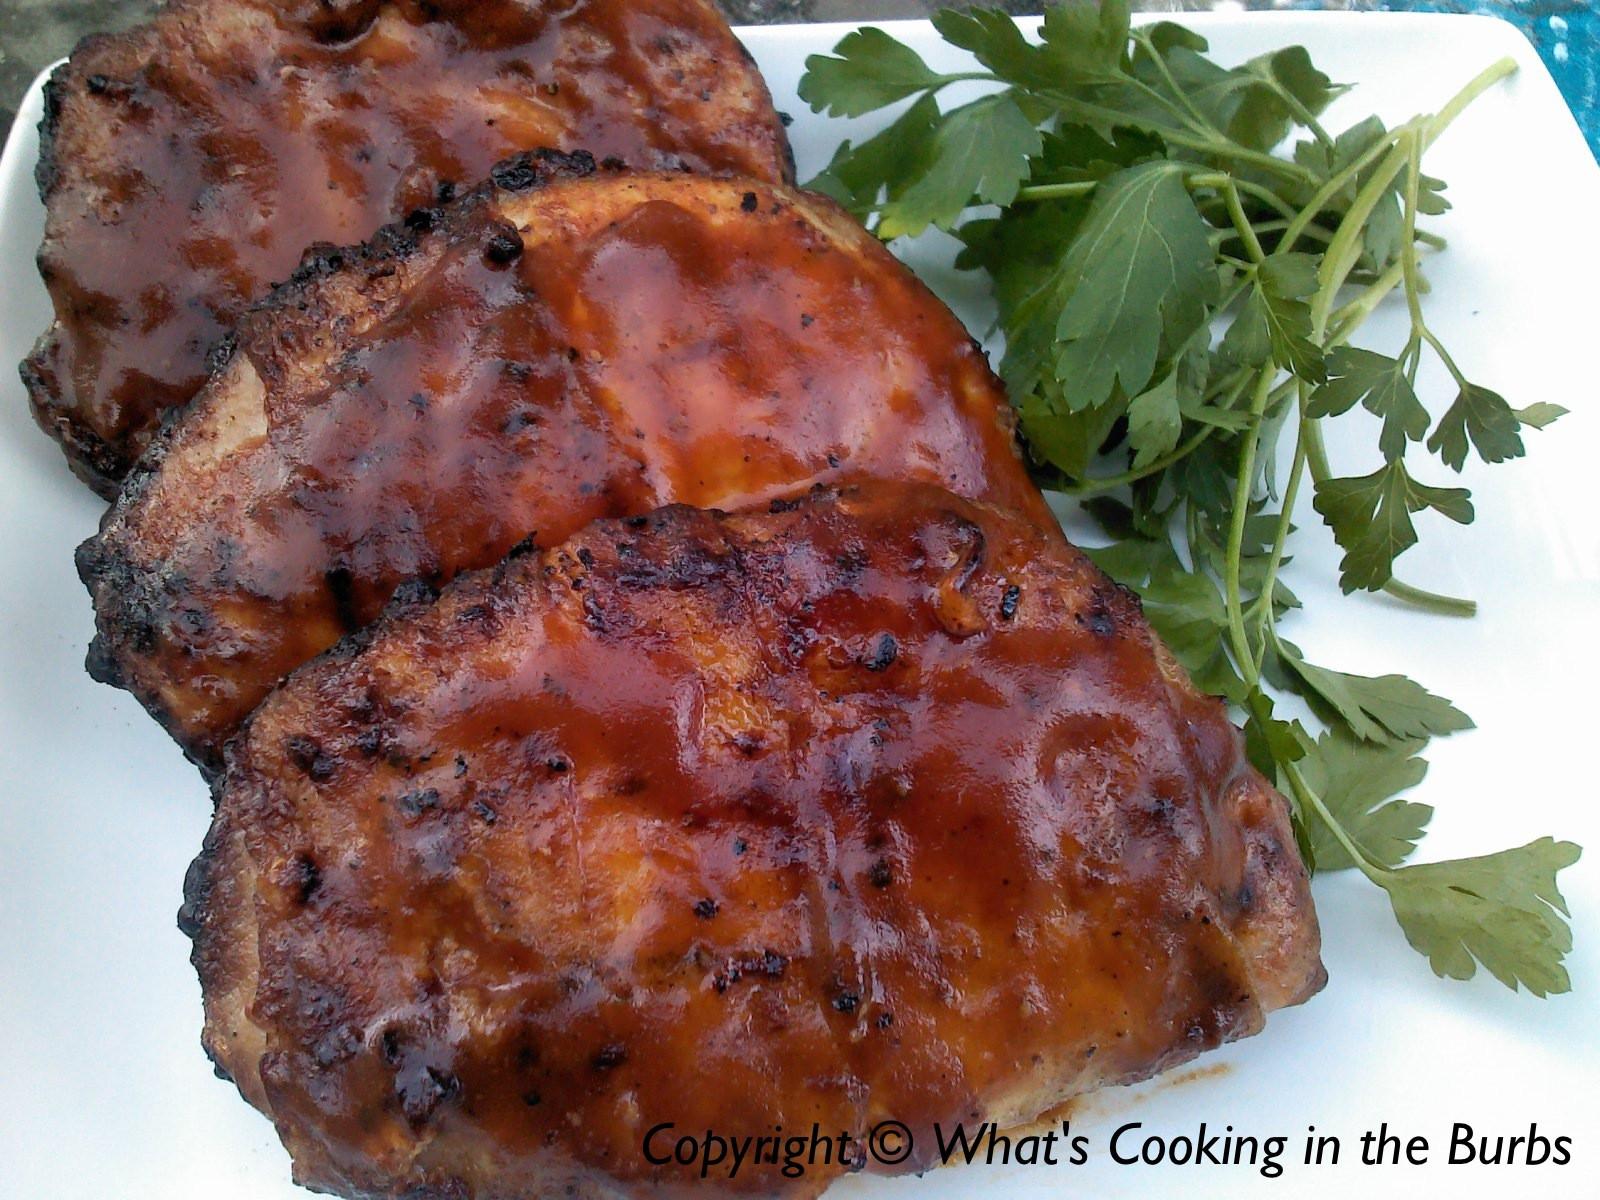 Bbq Pork Chops Oven  bbq pork chops oven